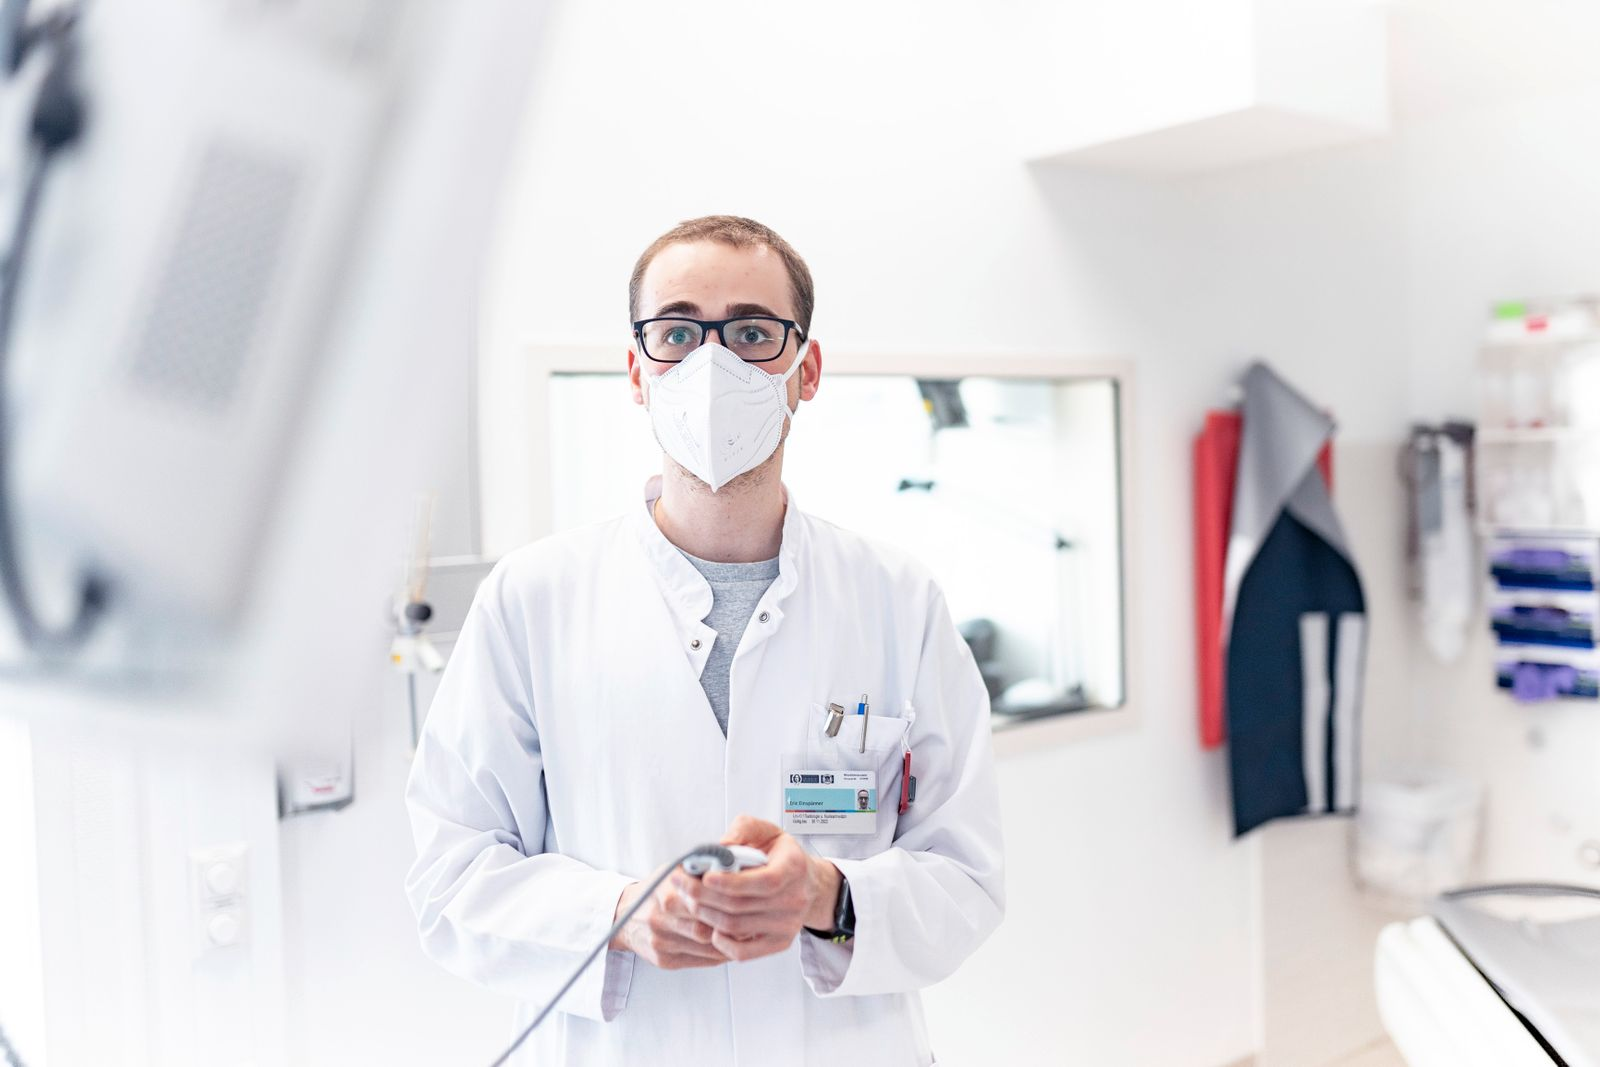 Medizinphysiker / Eric Einspänner